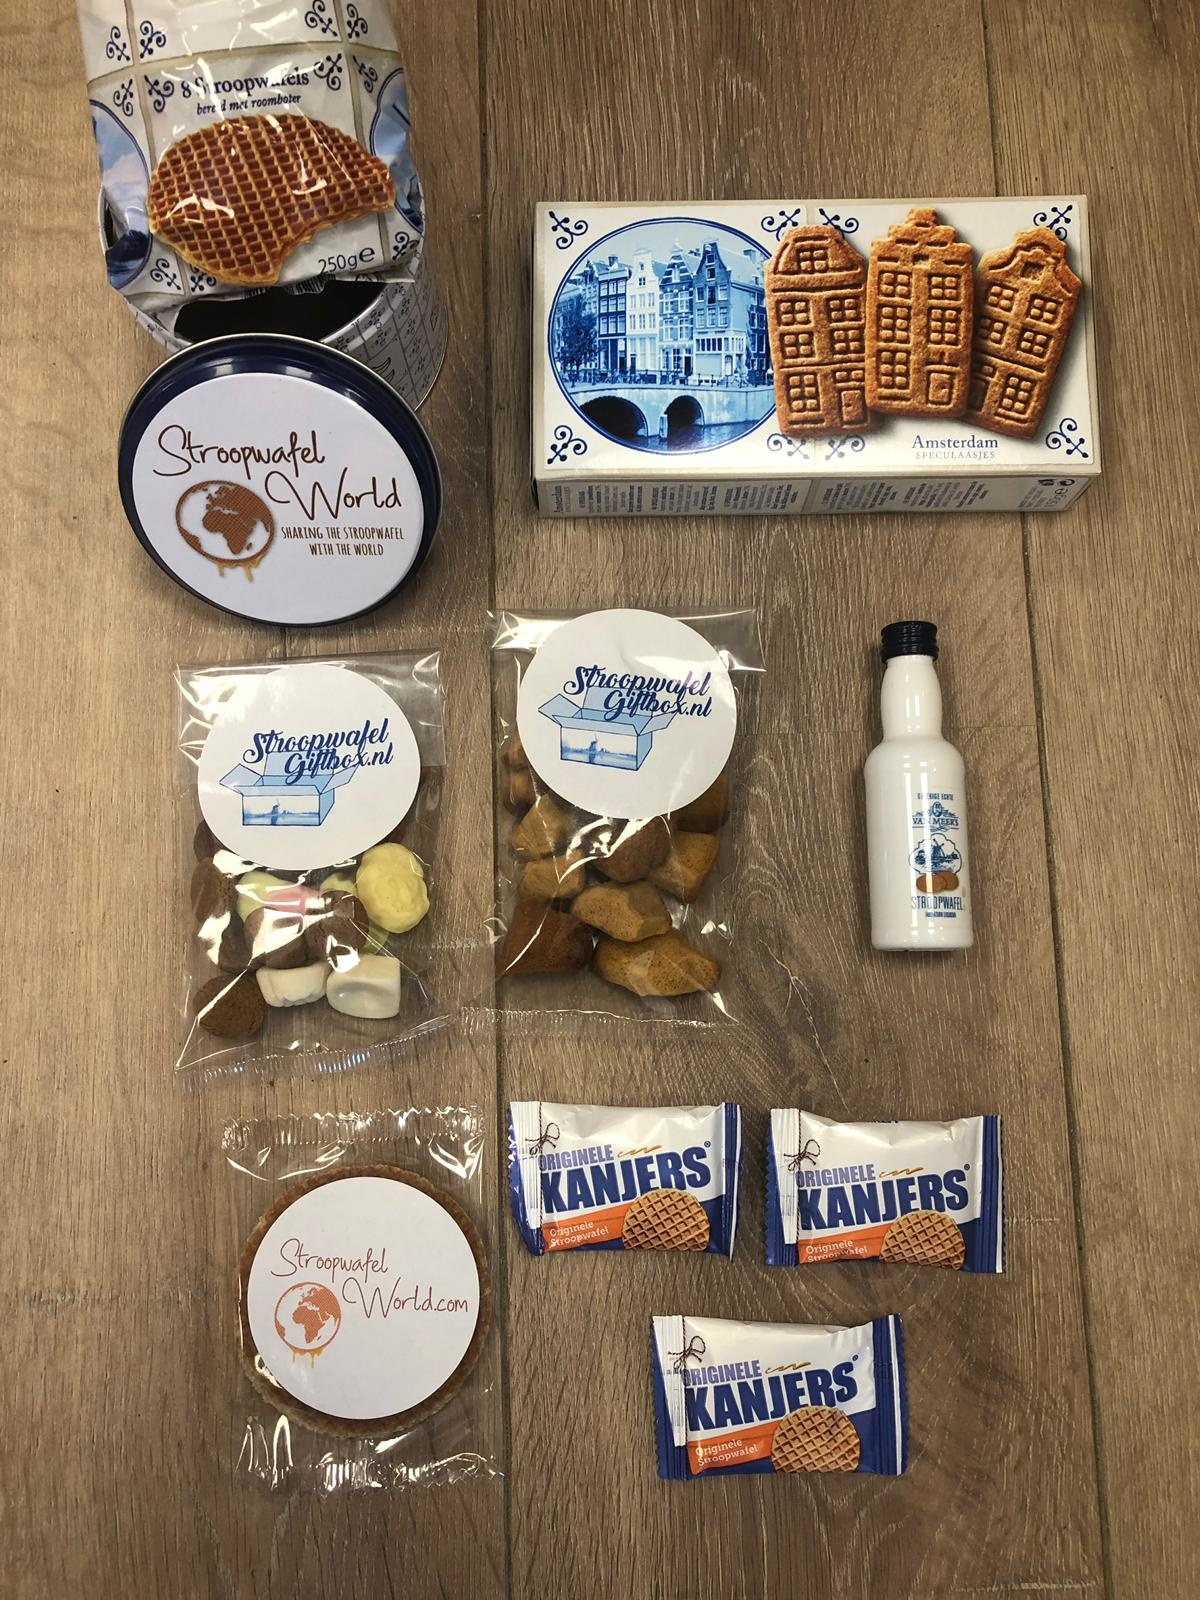 Stroopwafel Sinterklaas World Giftbag